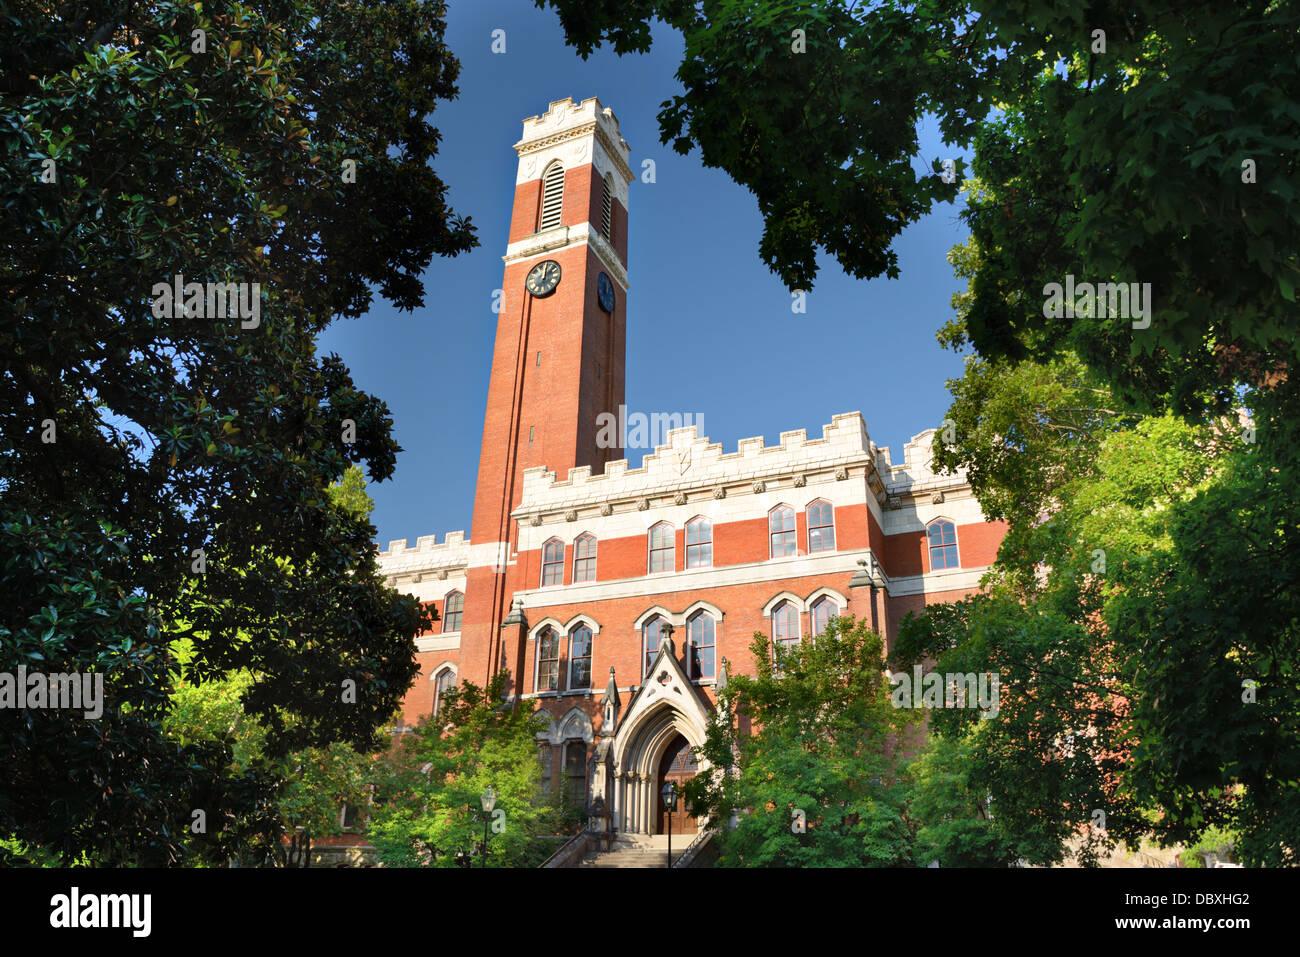 Campus de la Universidad de Vanderbilt en Nashville, Tennessee. Imagen De Stock